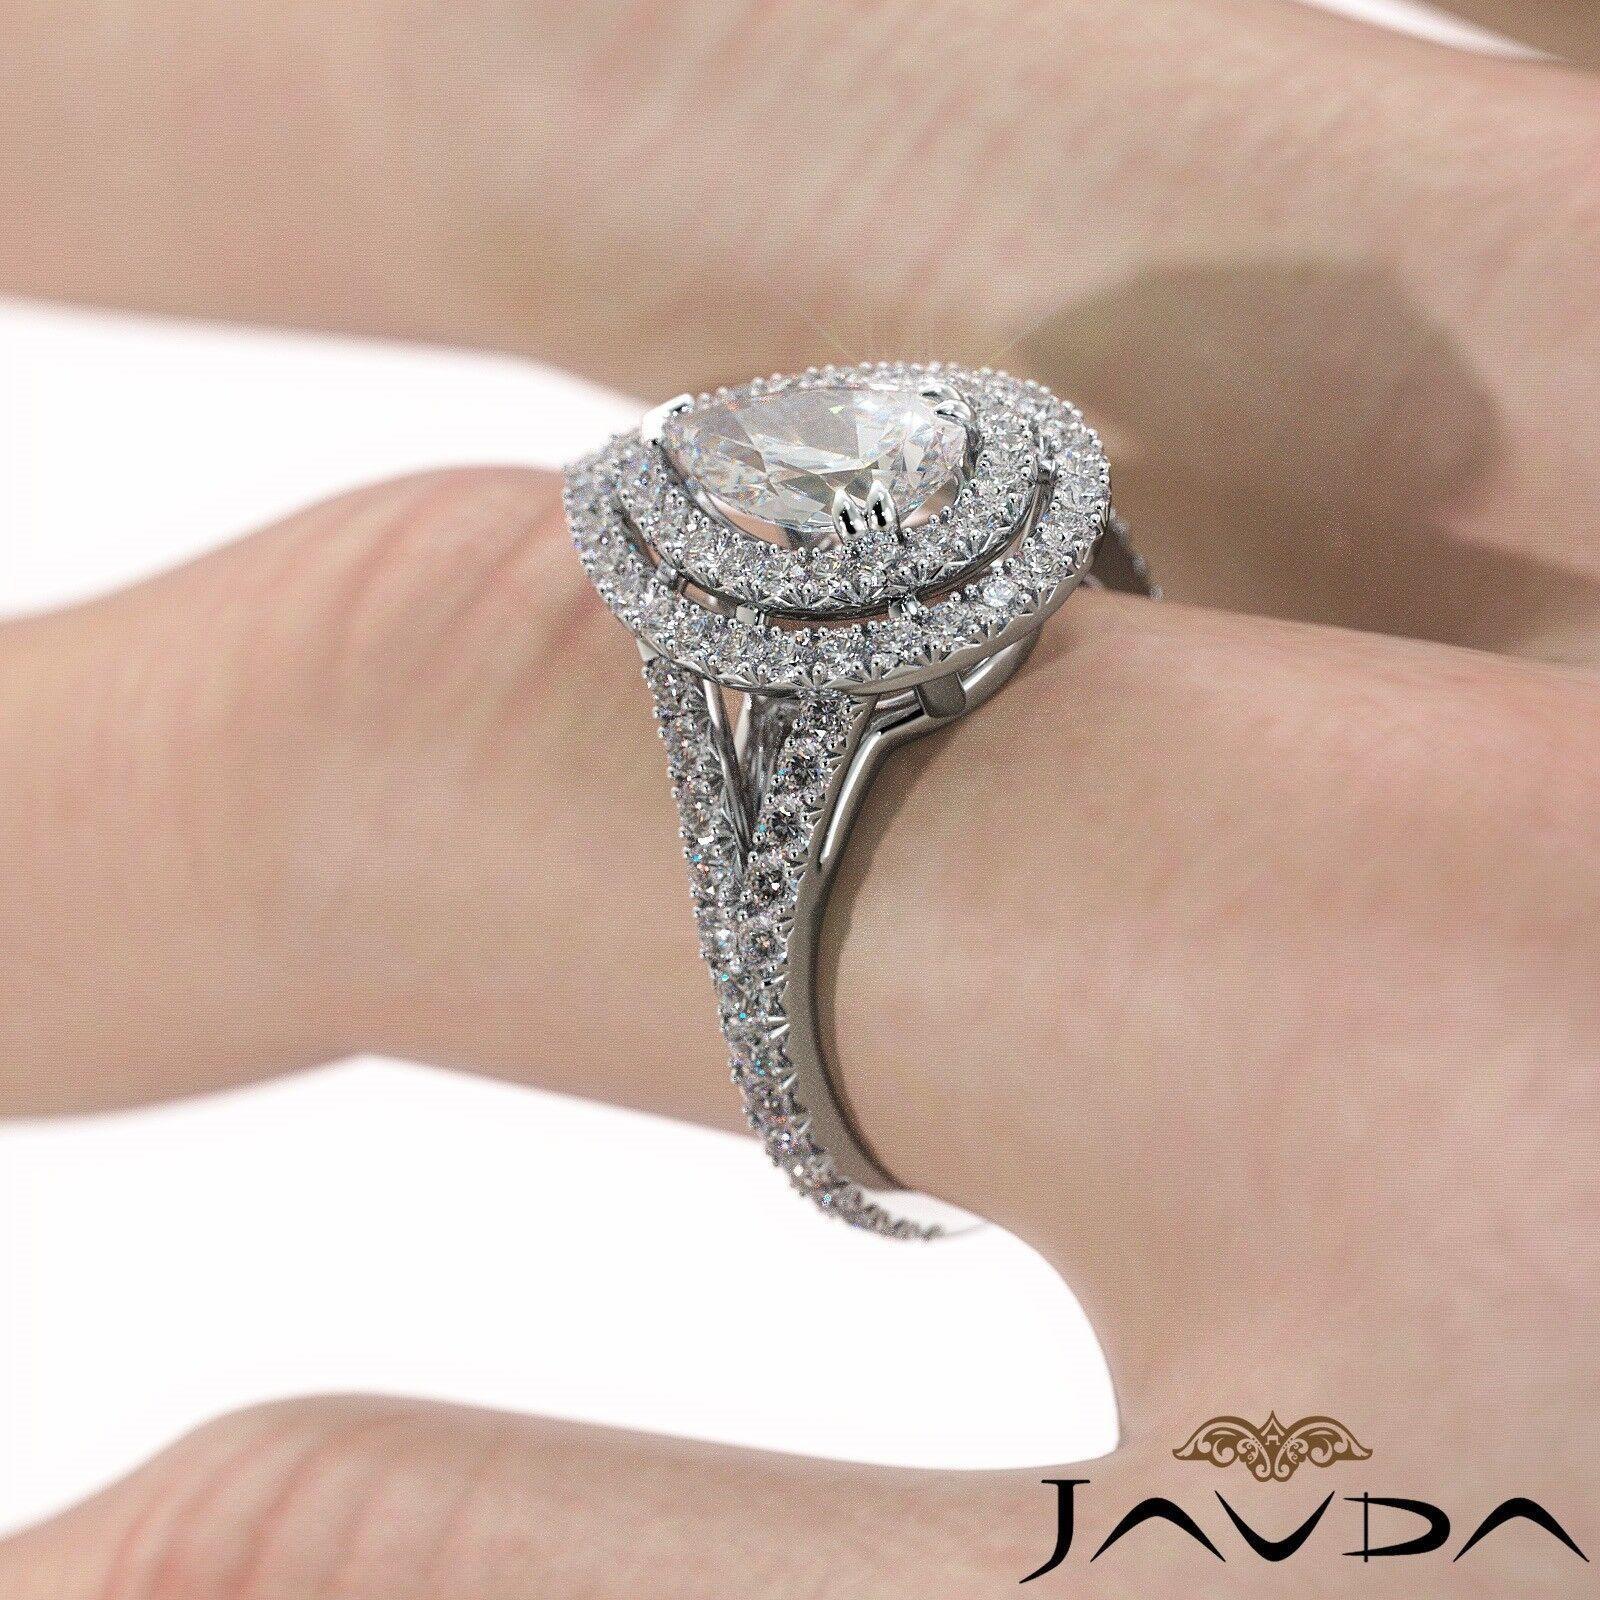 2.12ct Double Halo Split Shank Pear Diamond Engagement Ring GIA E-SI1 White Gold 6